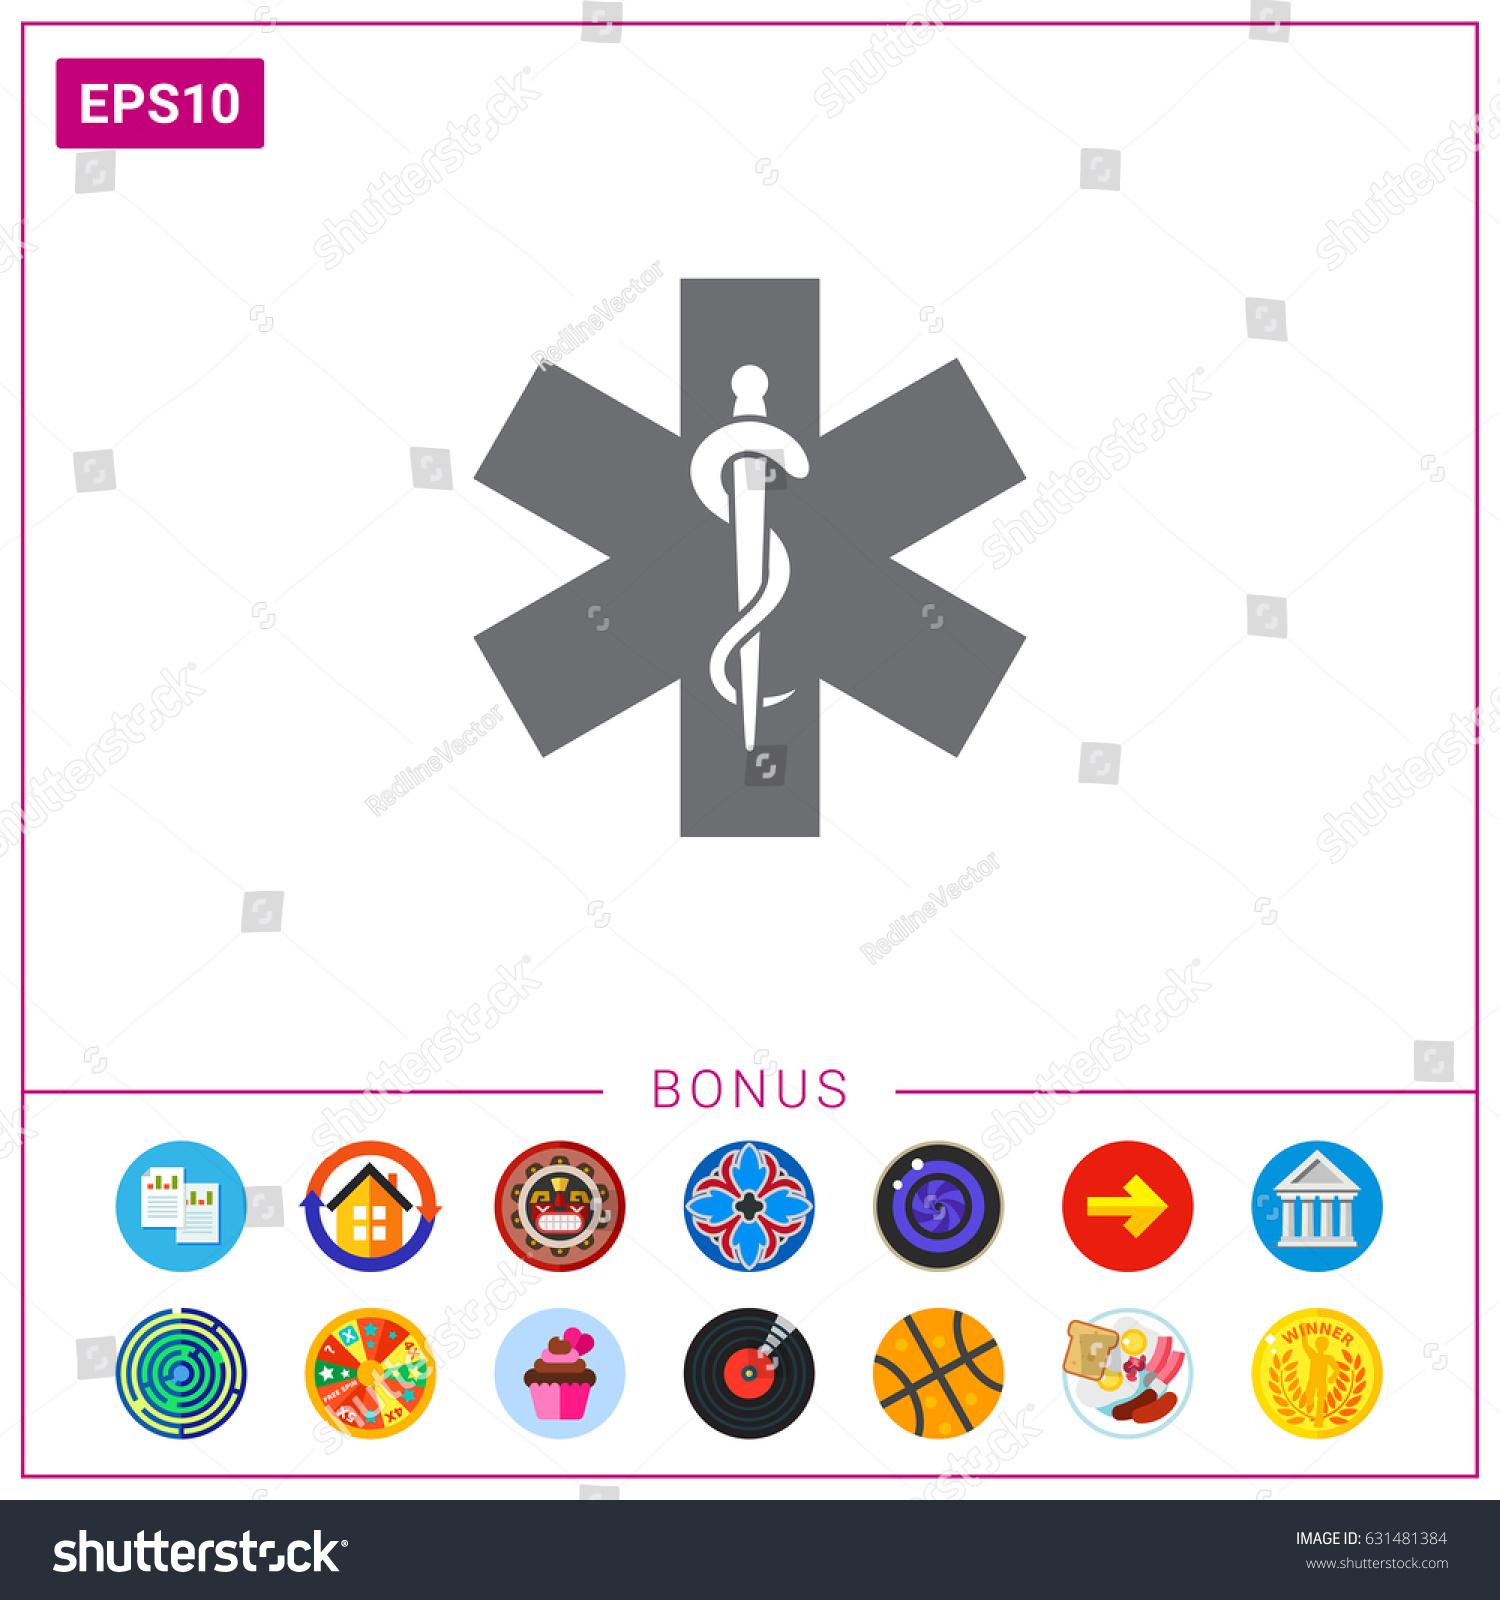 Medical Emergency Symbol Stock Photo Photo Vector Illustration